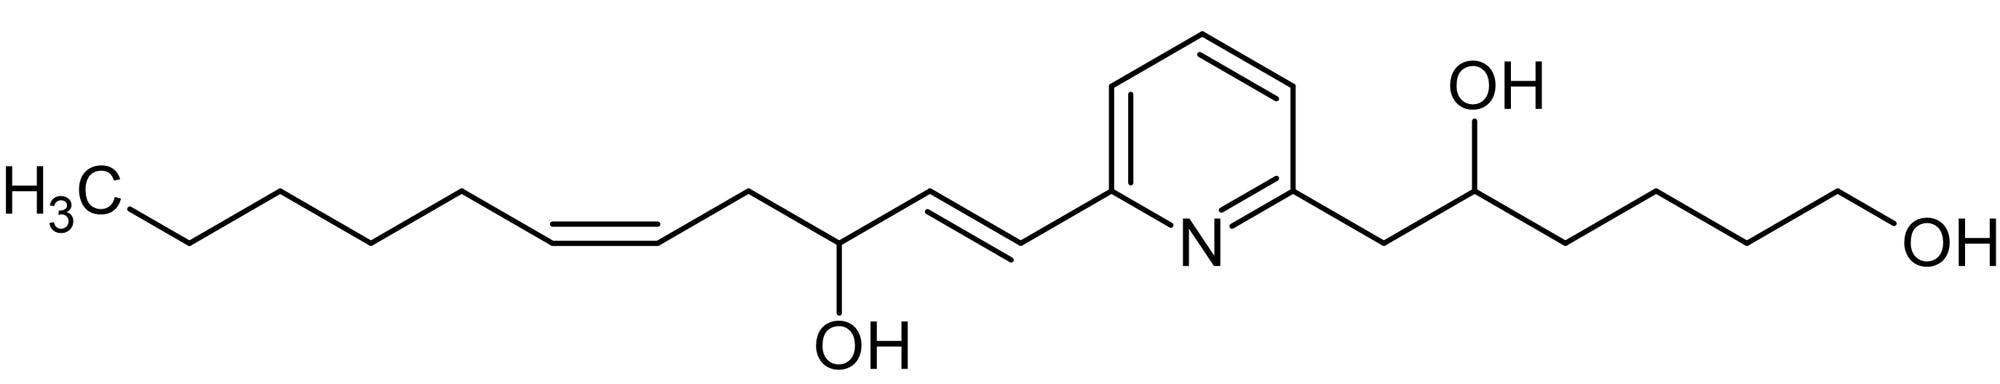 Chemical Structure - U-75302, Leukotriene B<sub>4</sub> BLT<sub>1</sub> receptor antagonist (ab141736)